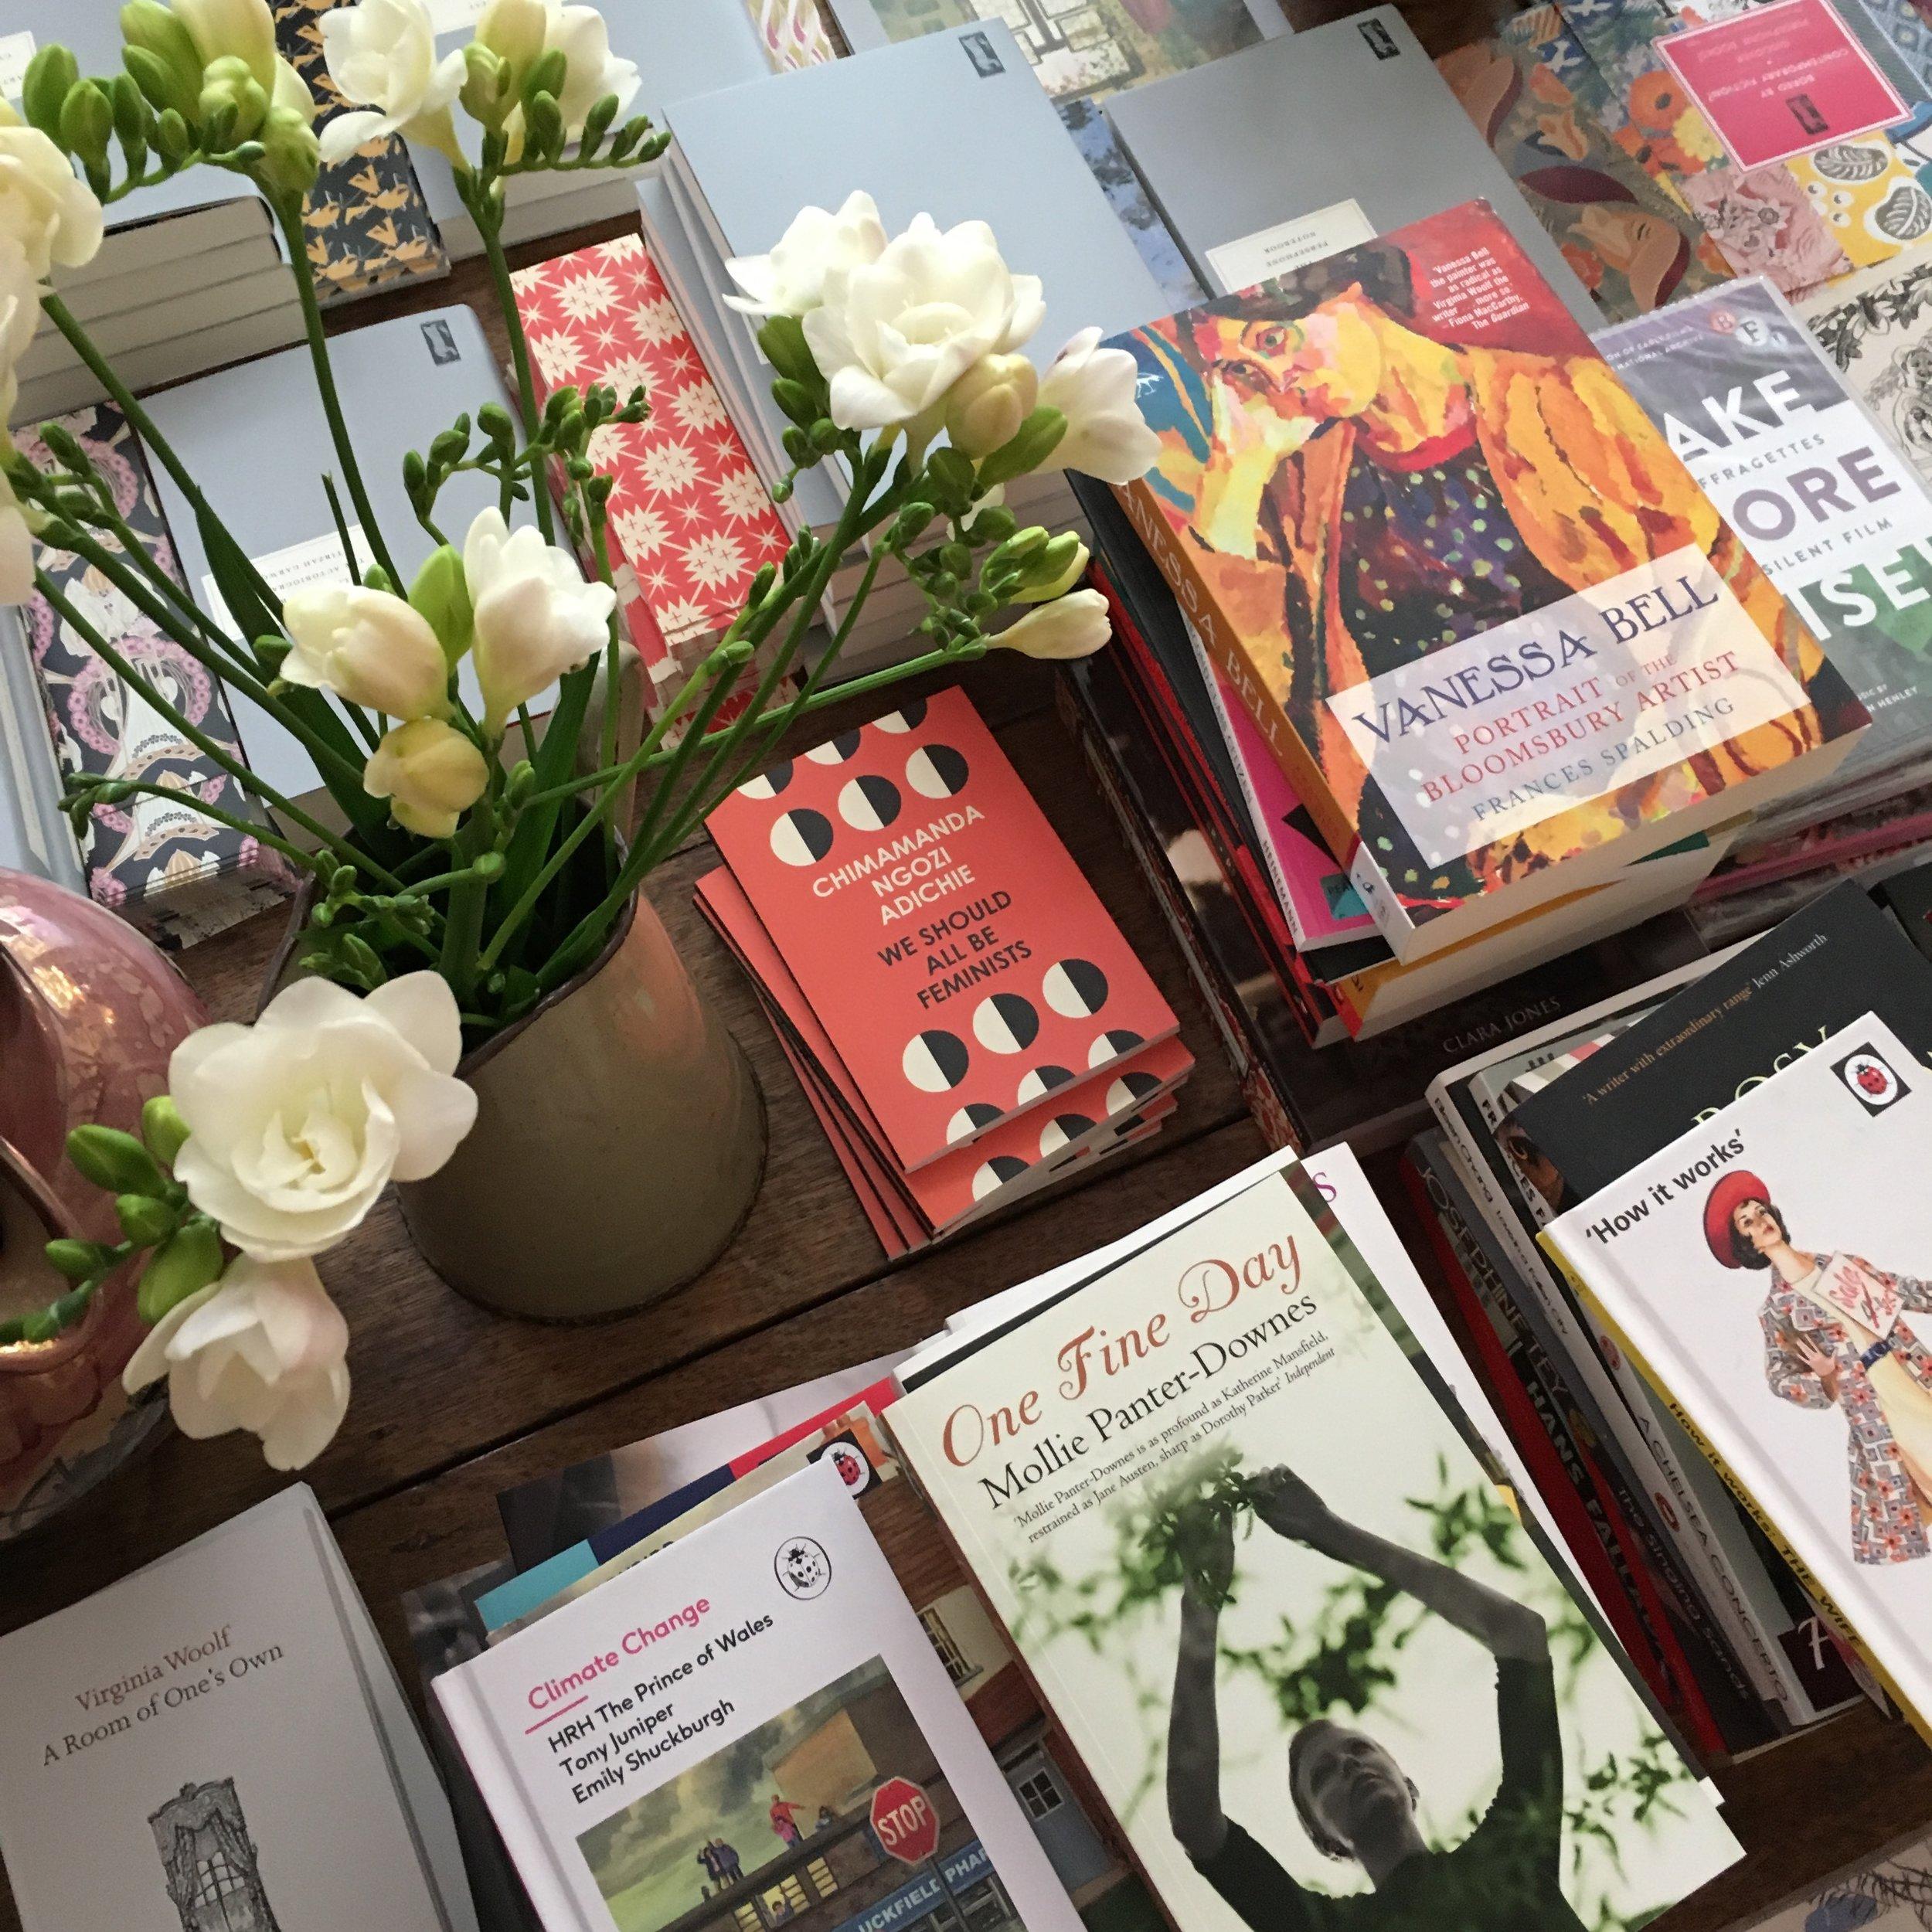 persephone-books-london-1